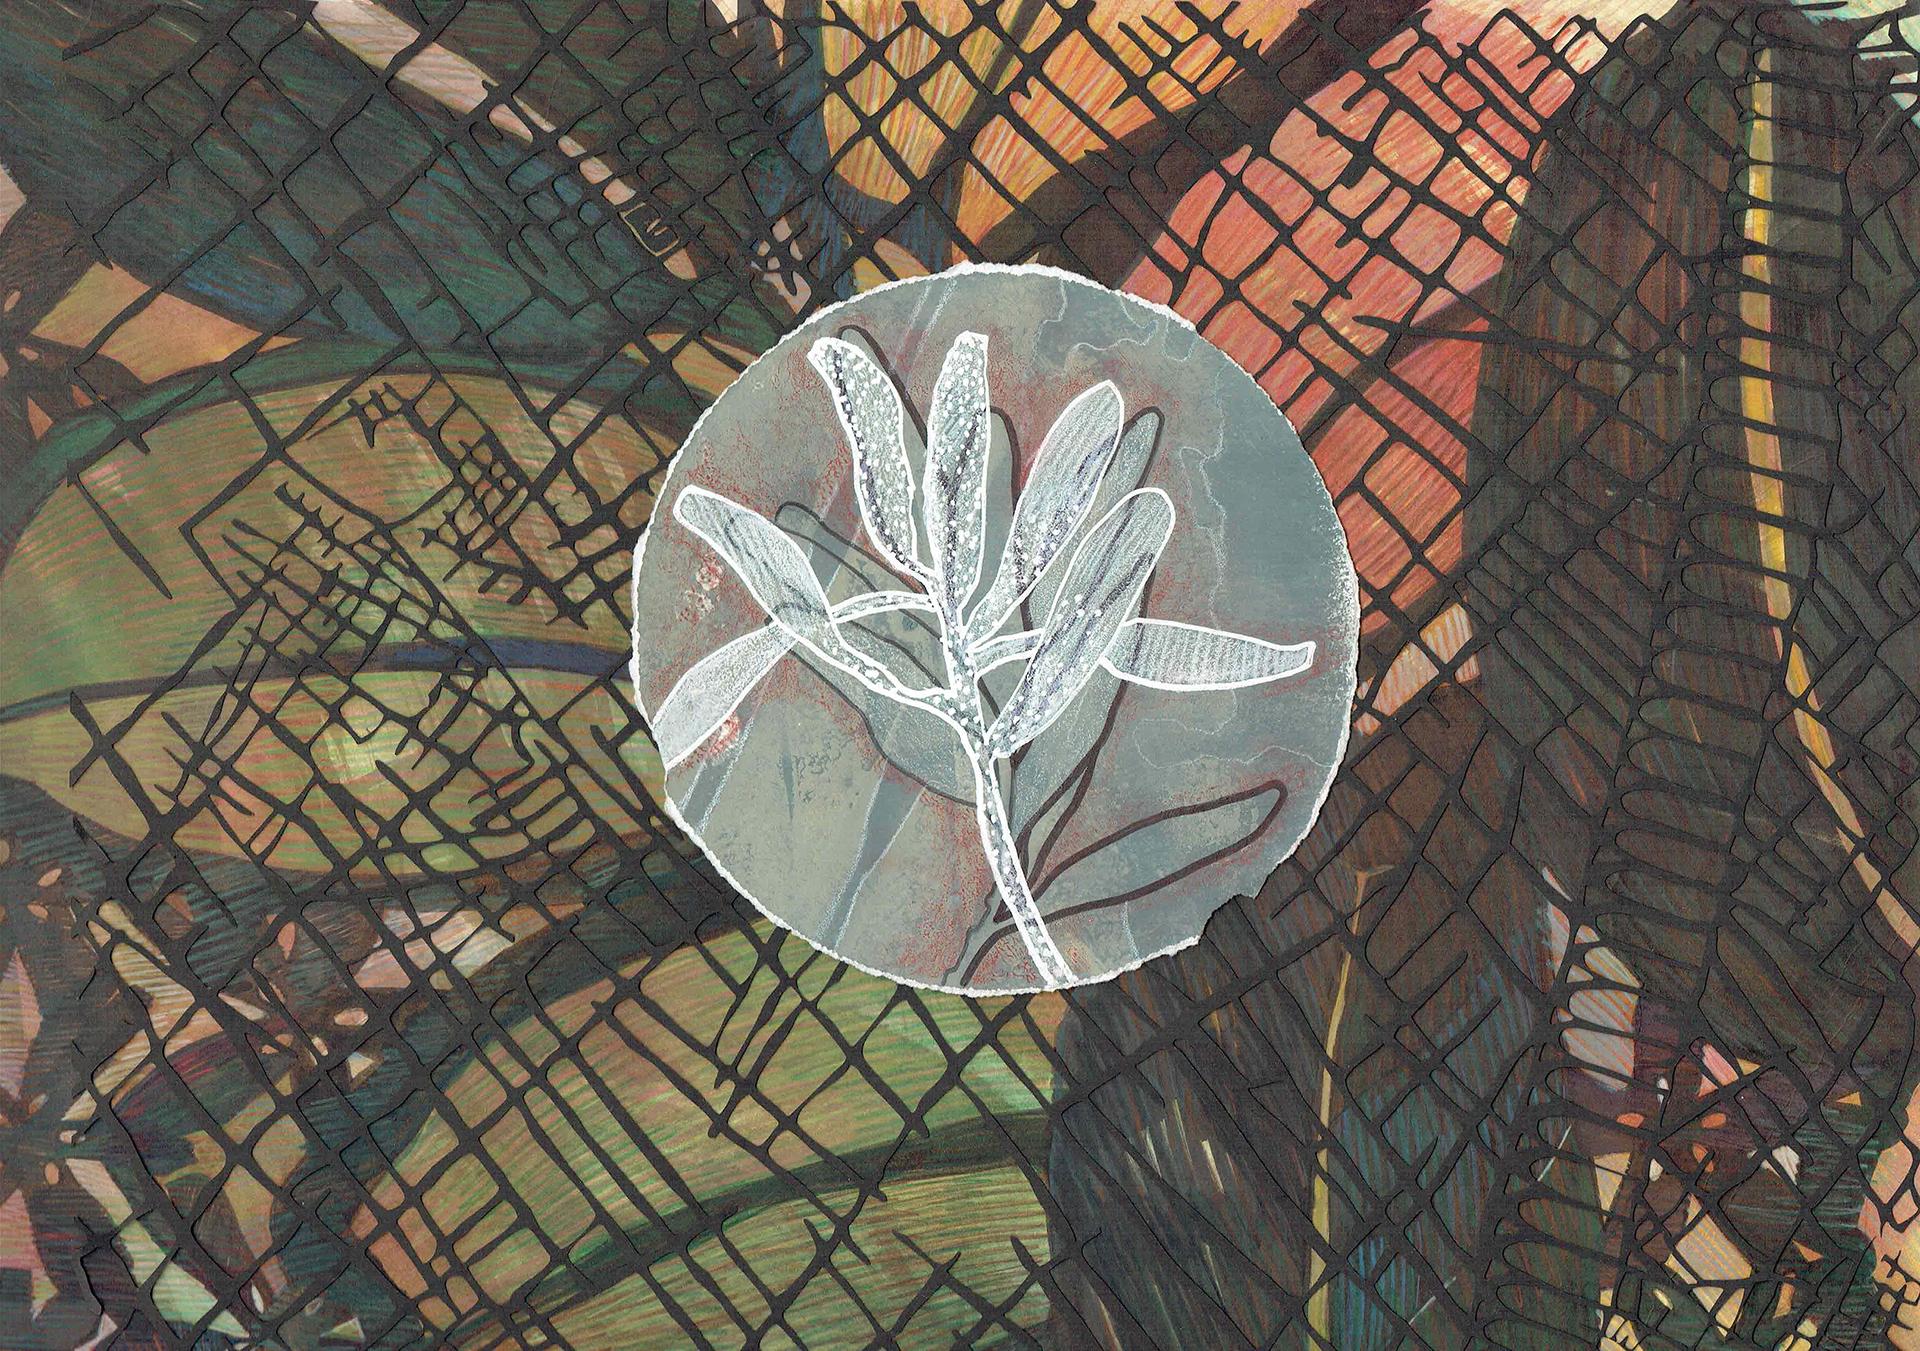 Emma Robertson - Micrographia 2